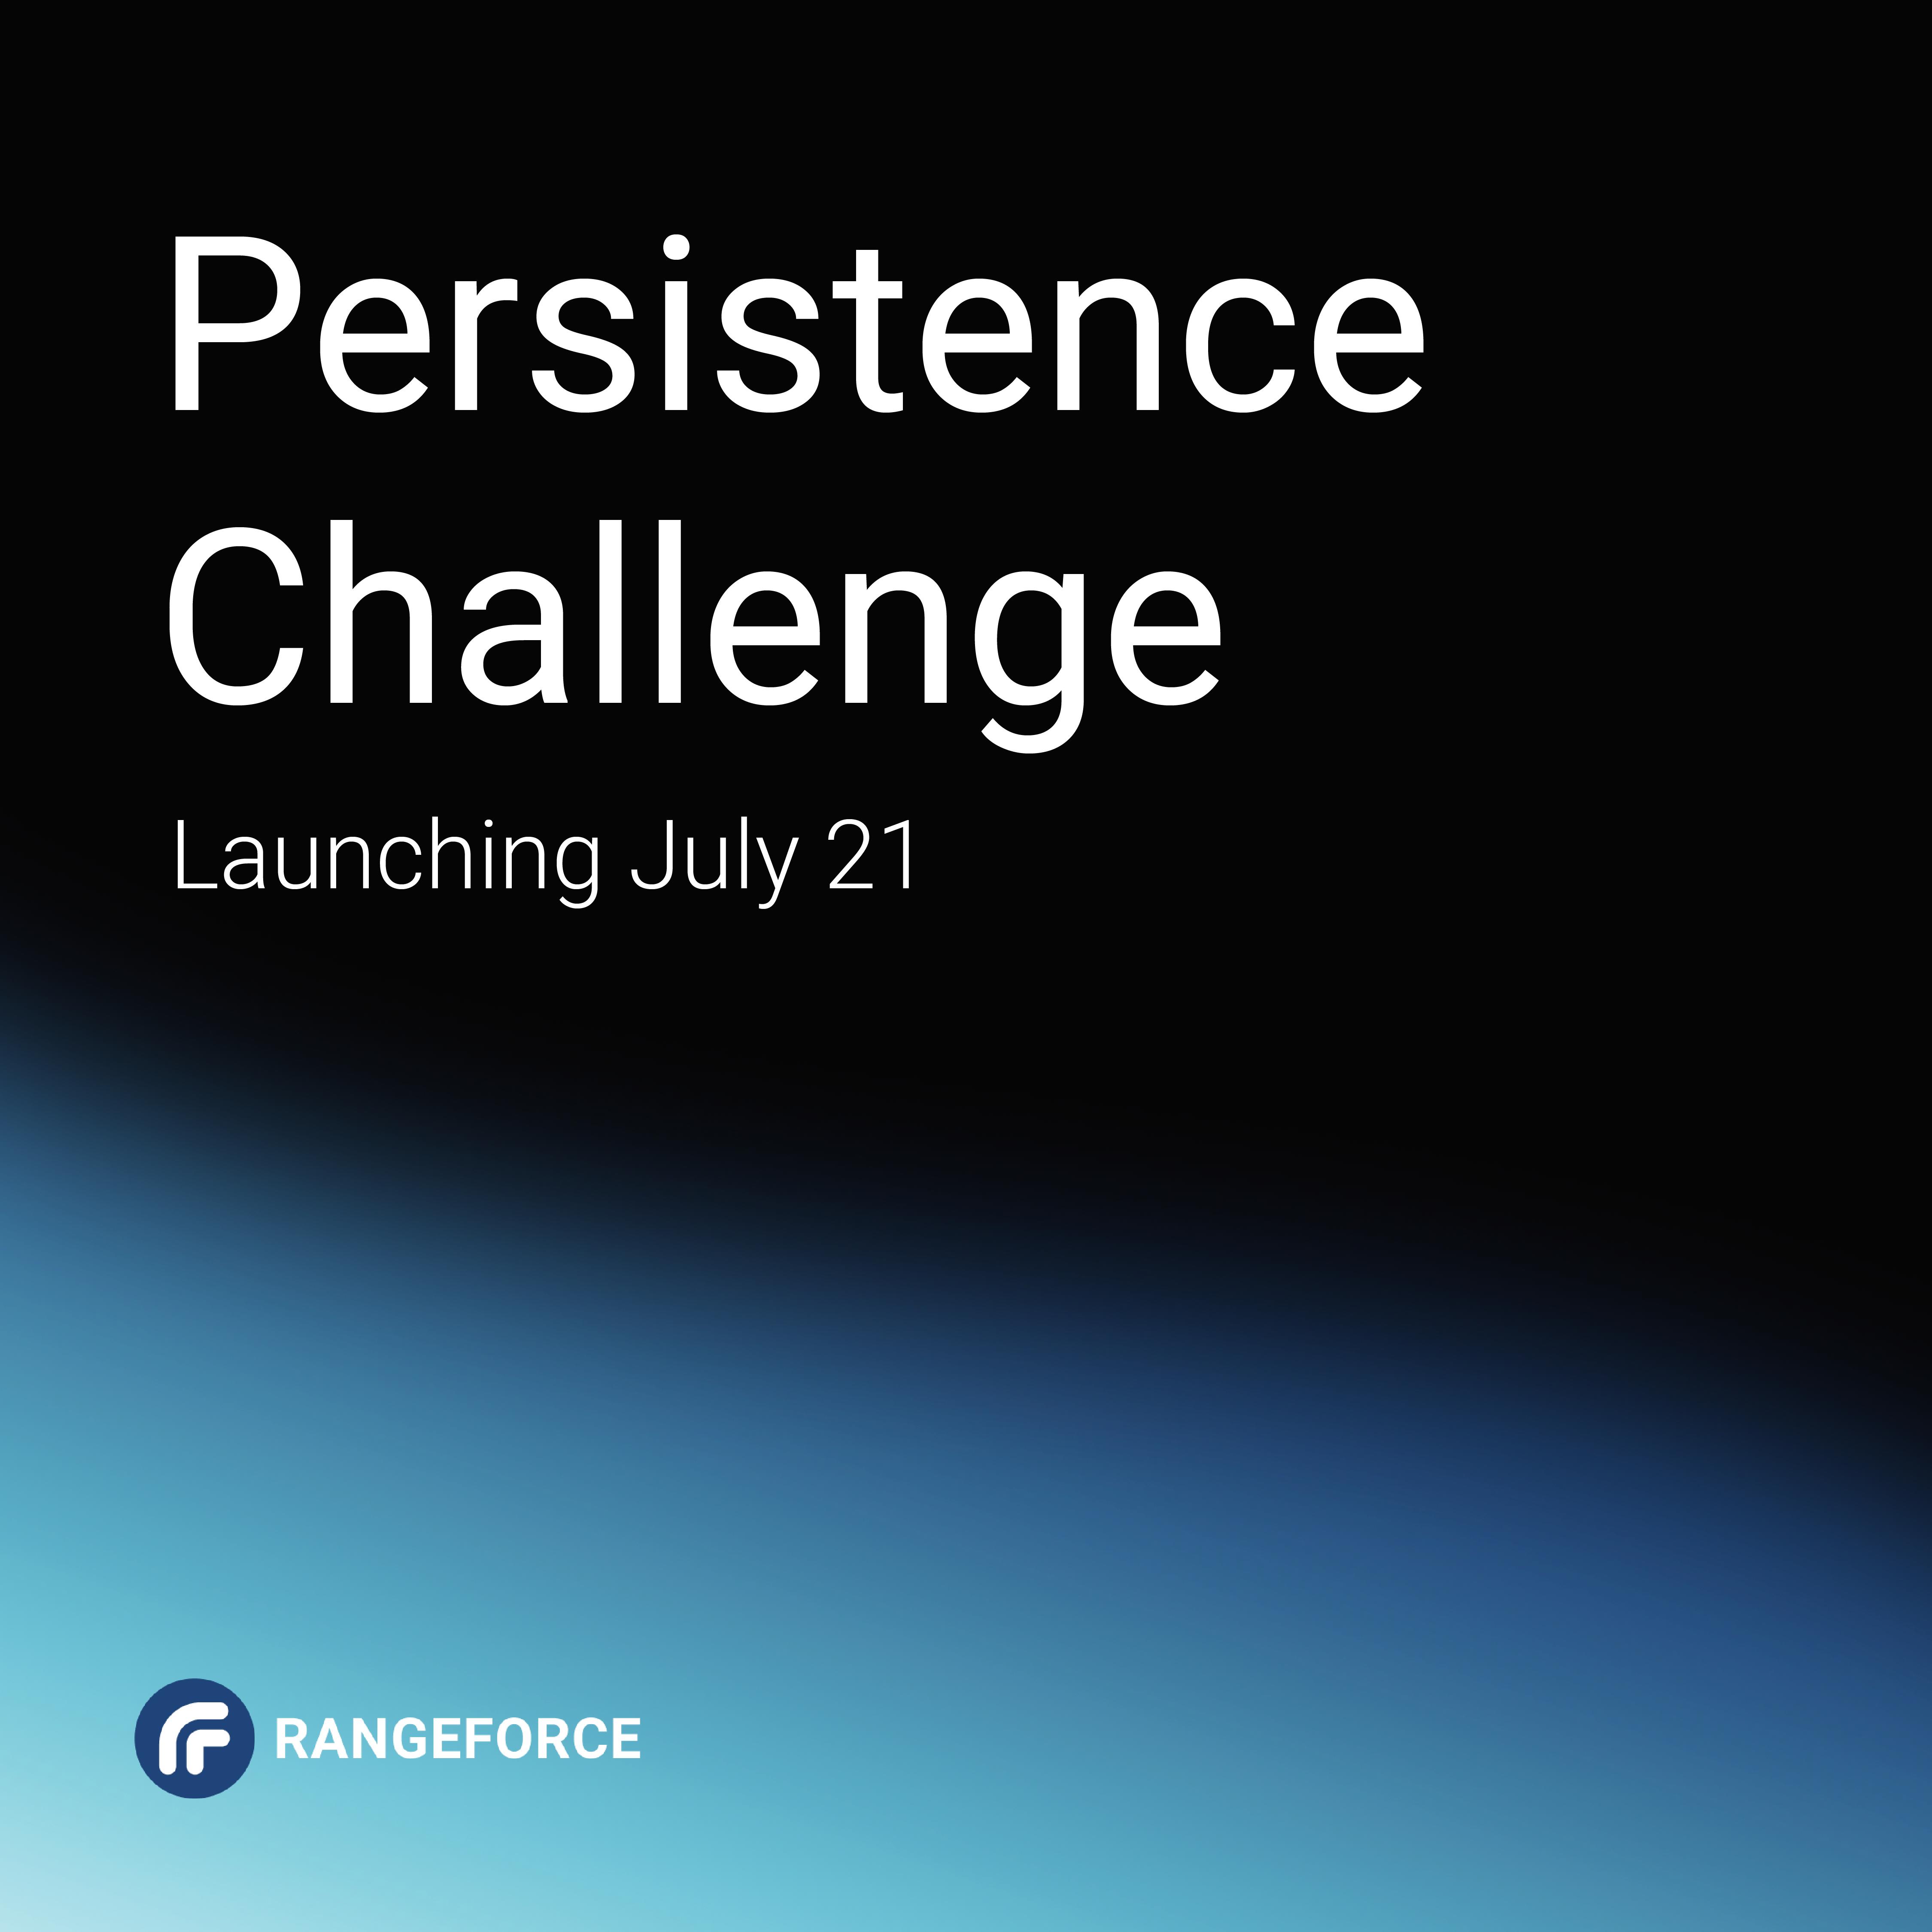 persistence challenge 2